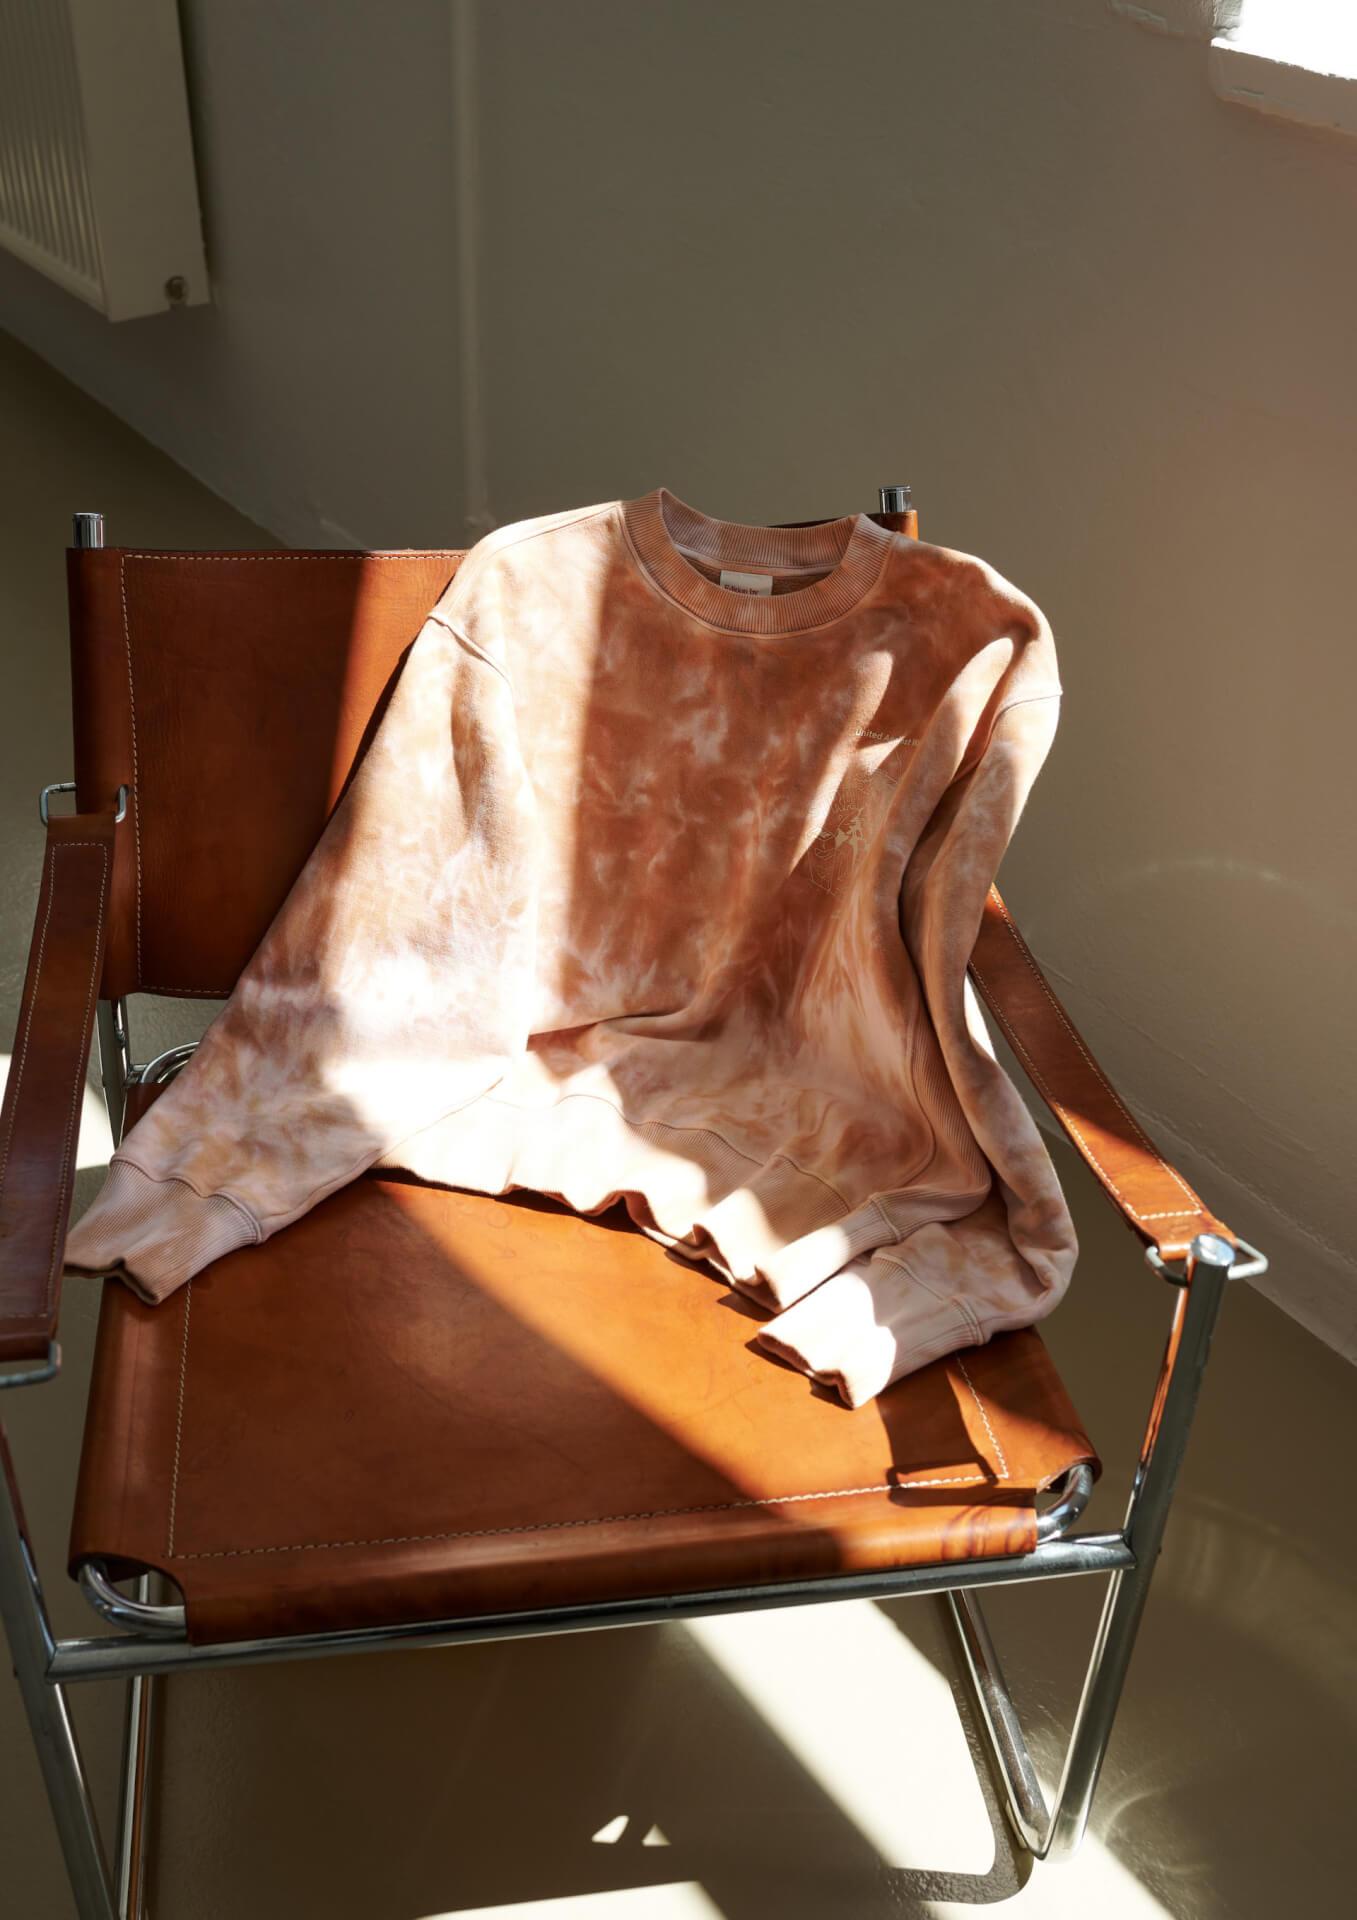 H&Mが俳優のジョン・ボイエガとタッグを組んだメンズウェアコレクションを発表!リサイクル素材、オーガニック素材を使用したアイテムが登場 life211006_handm_john_boyega_013